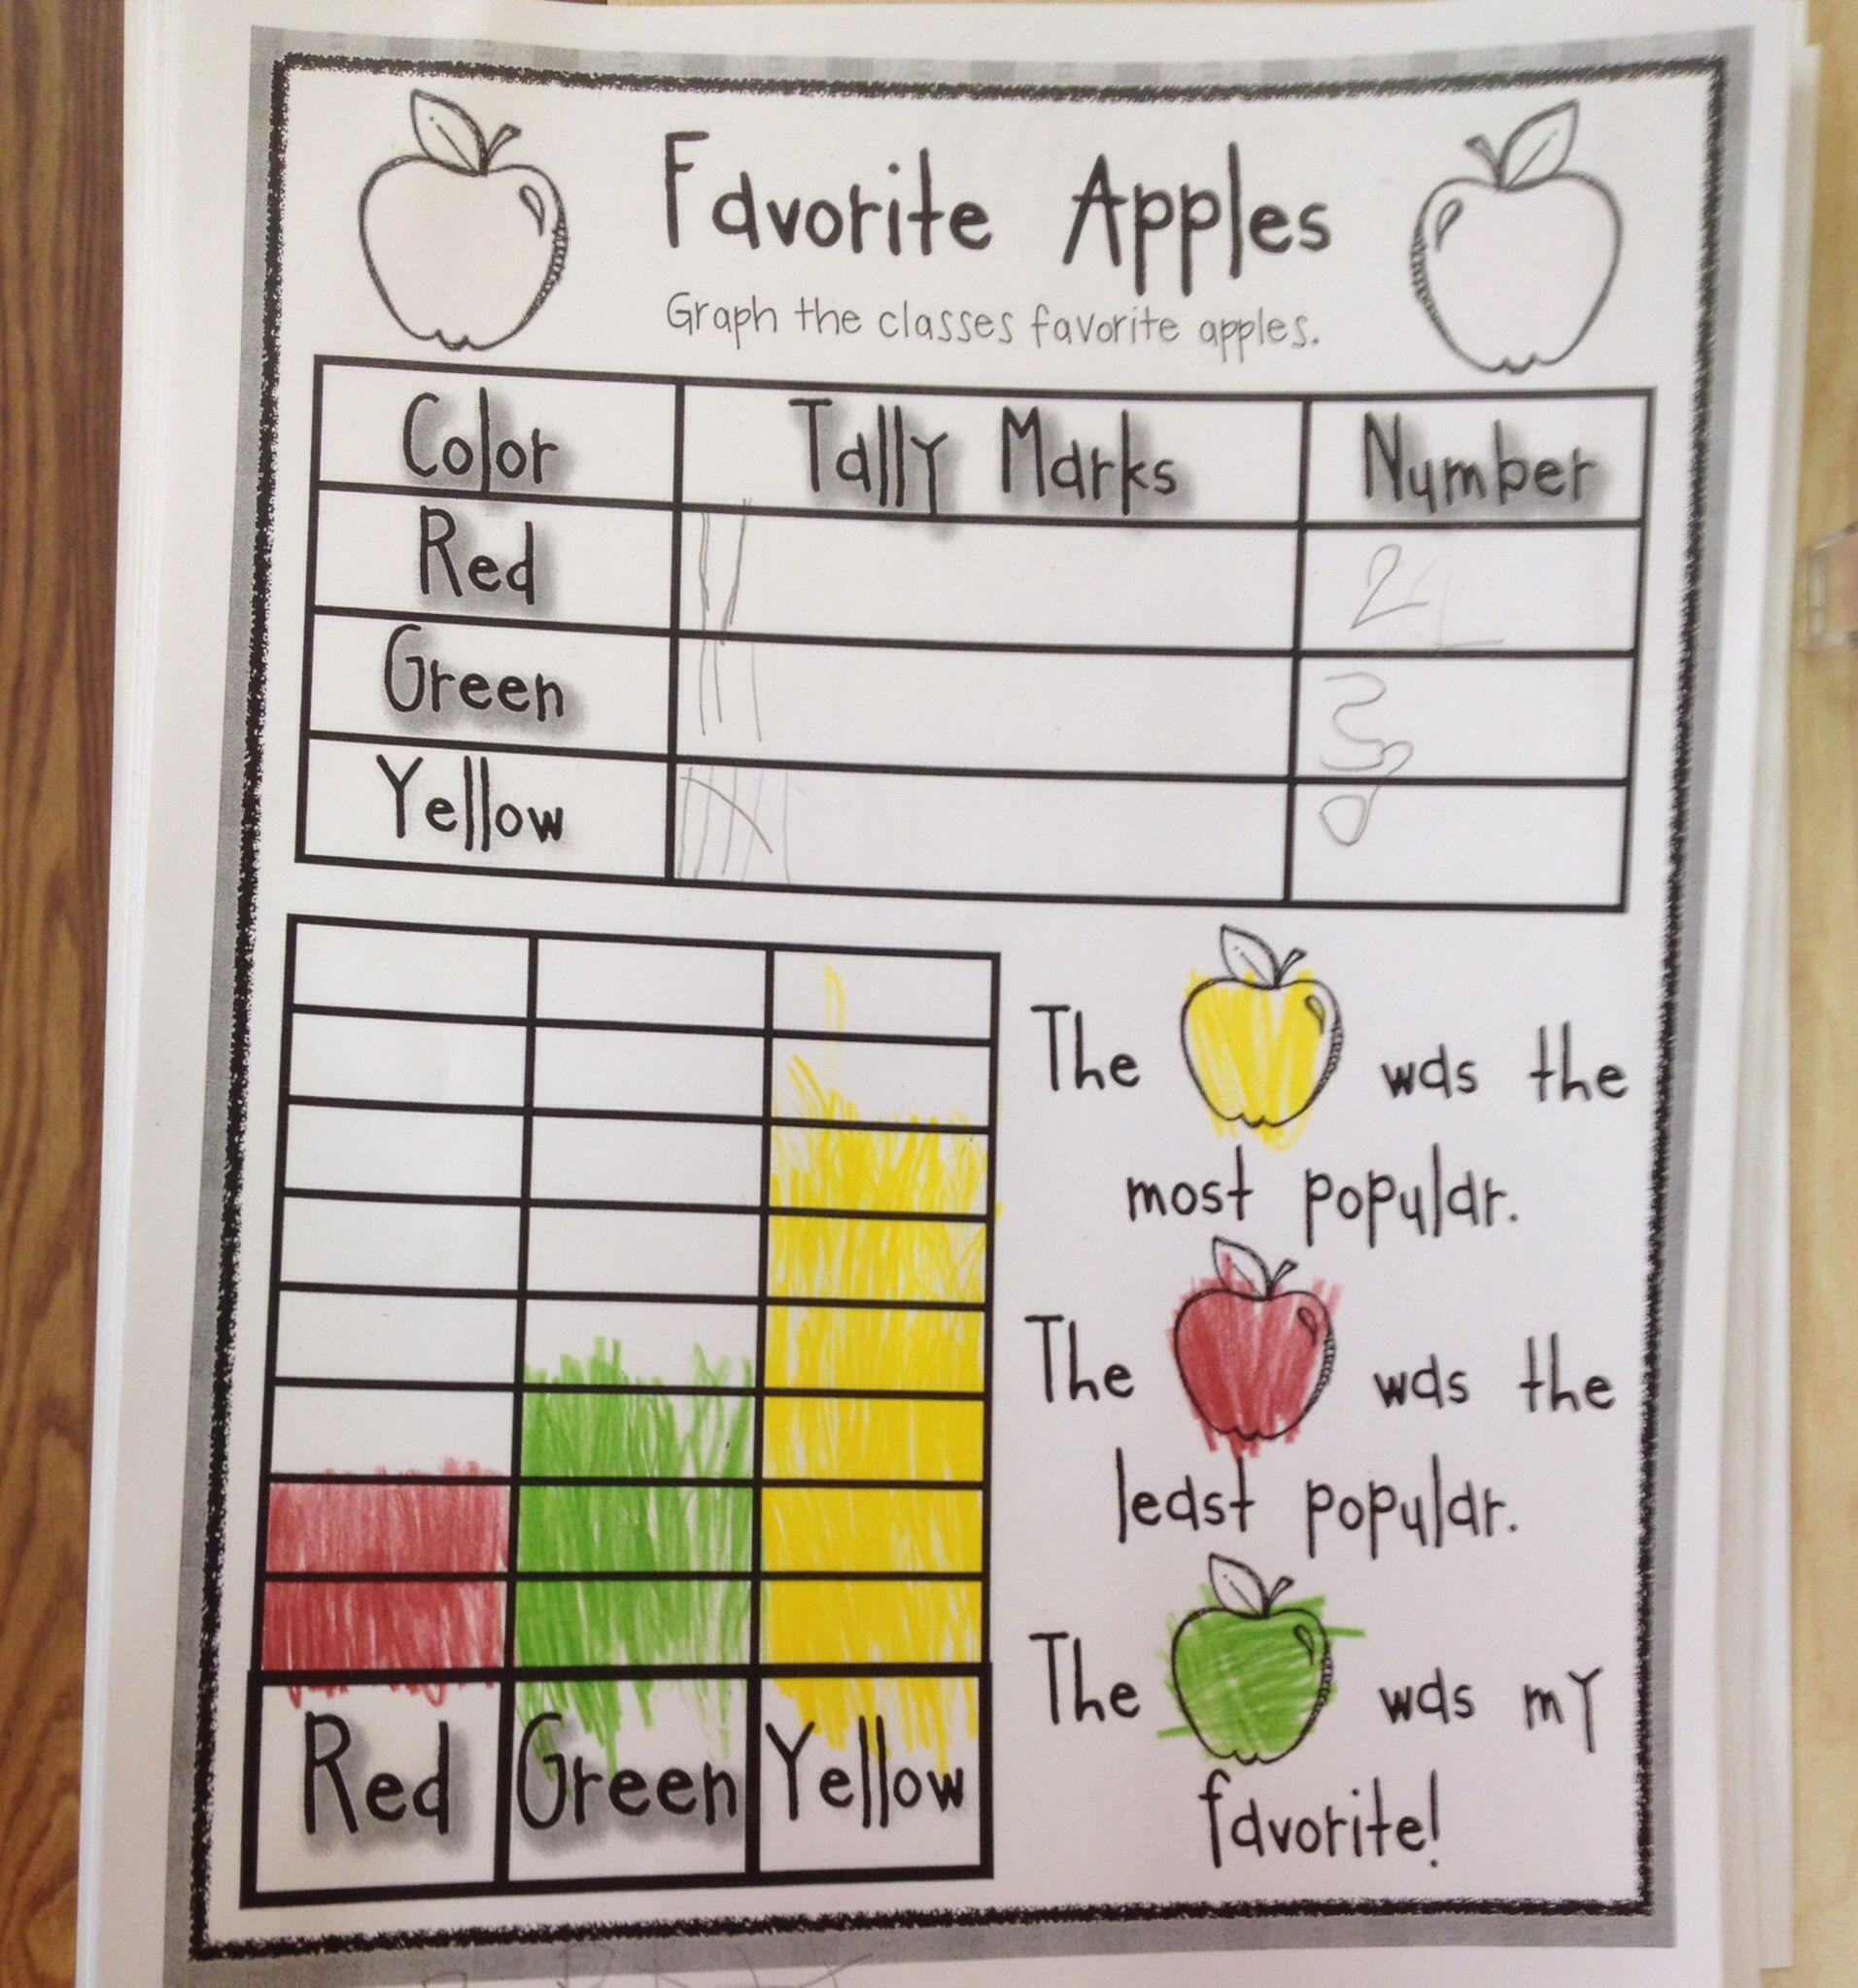 Apple Taste Test We Did An Apple Taste Test With Green